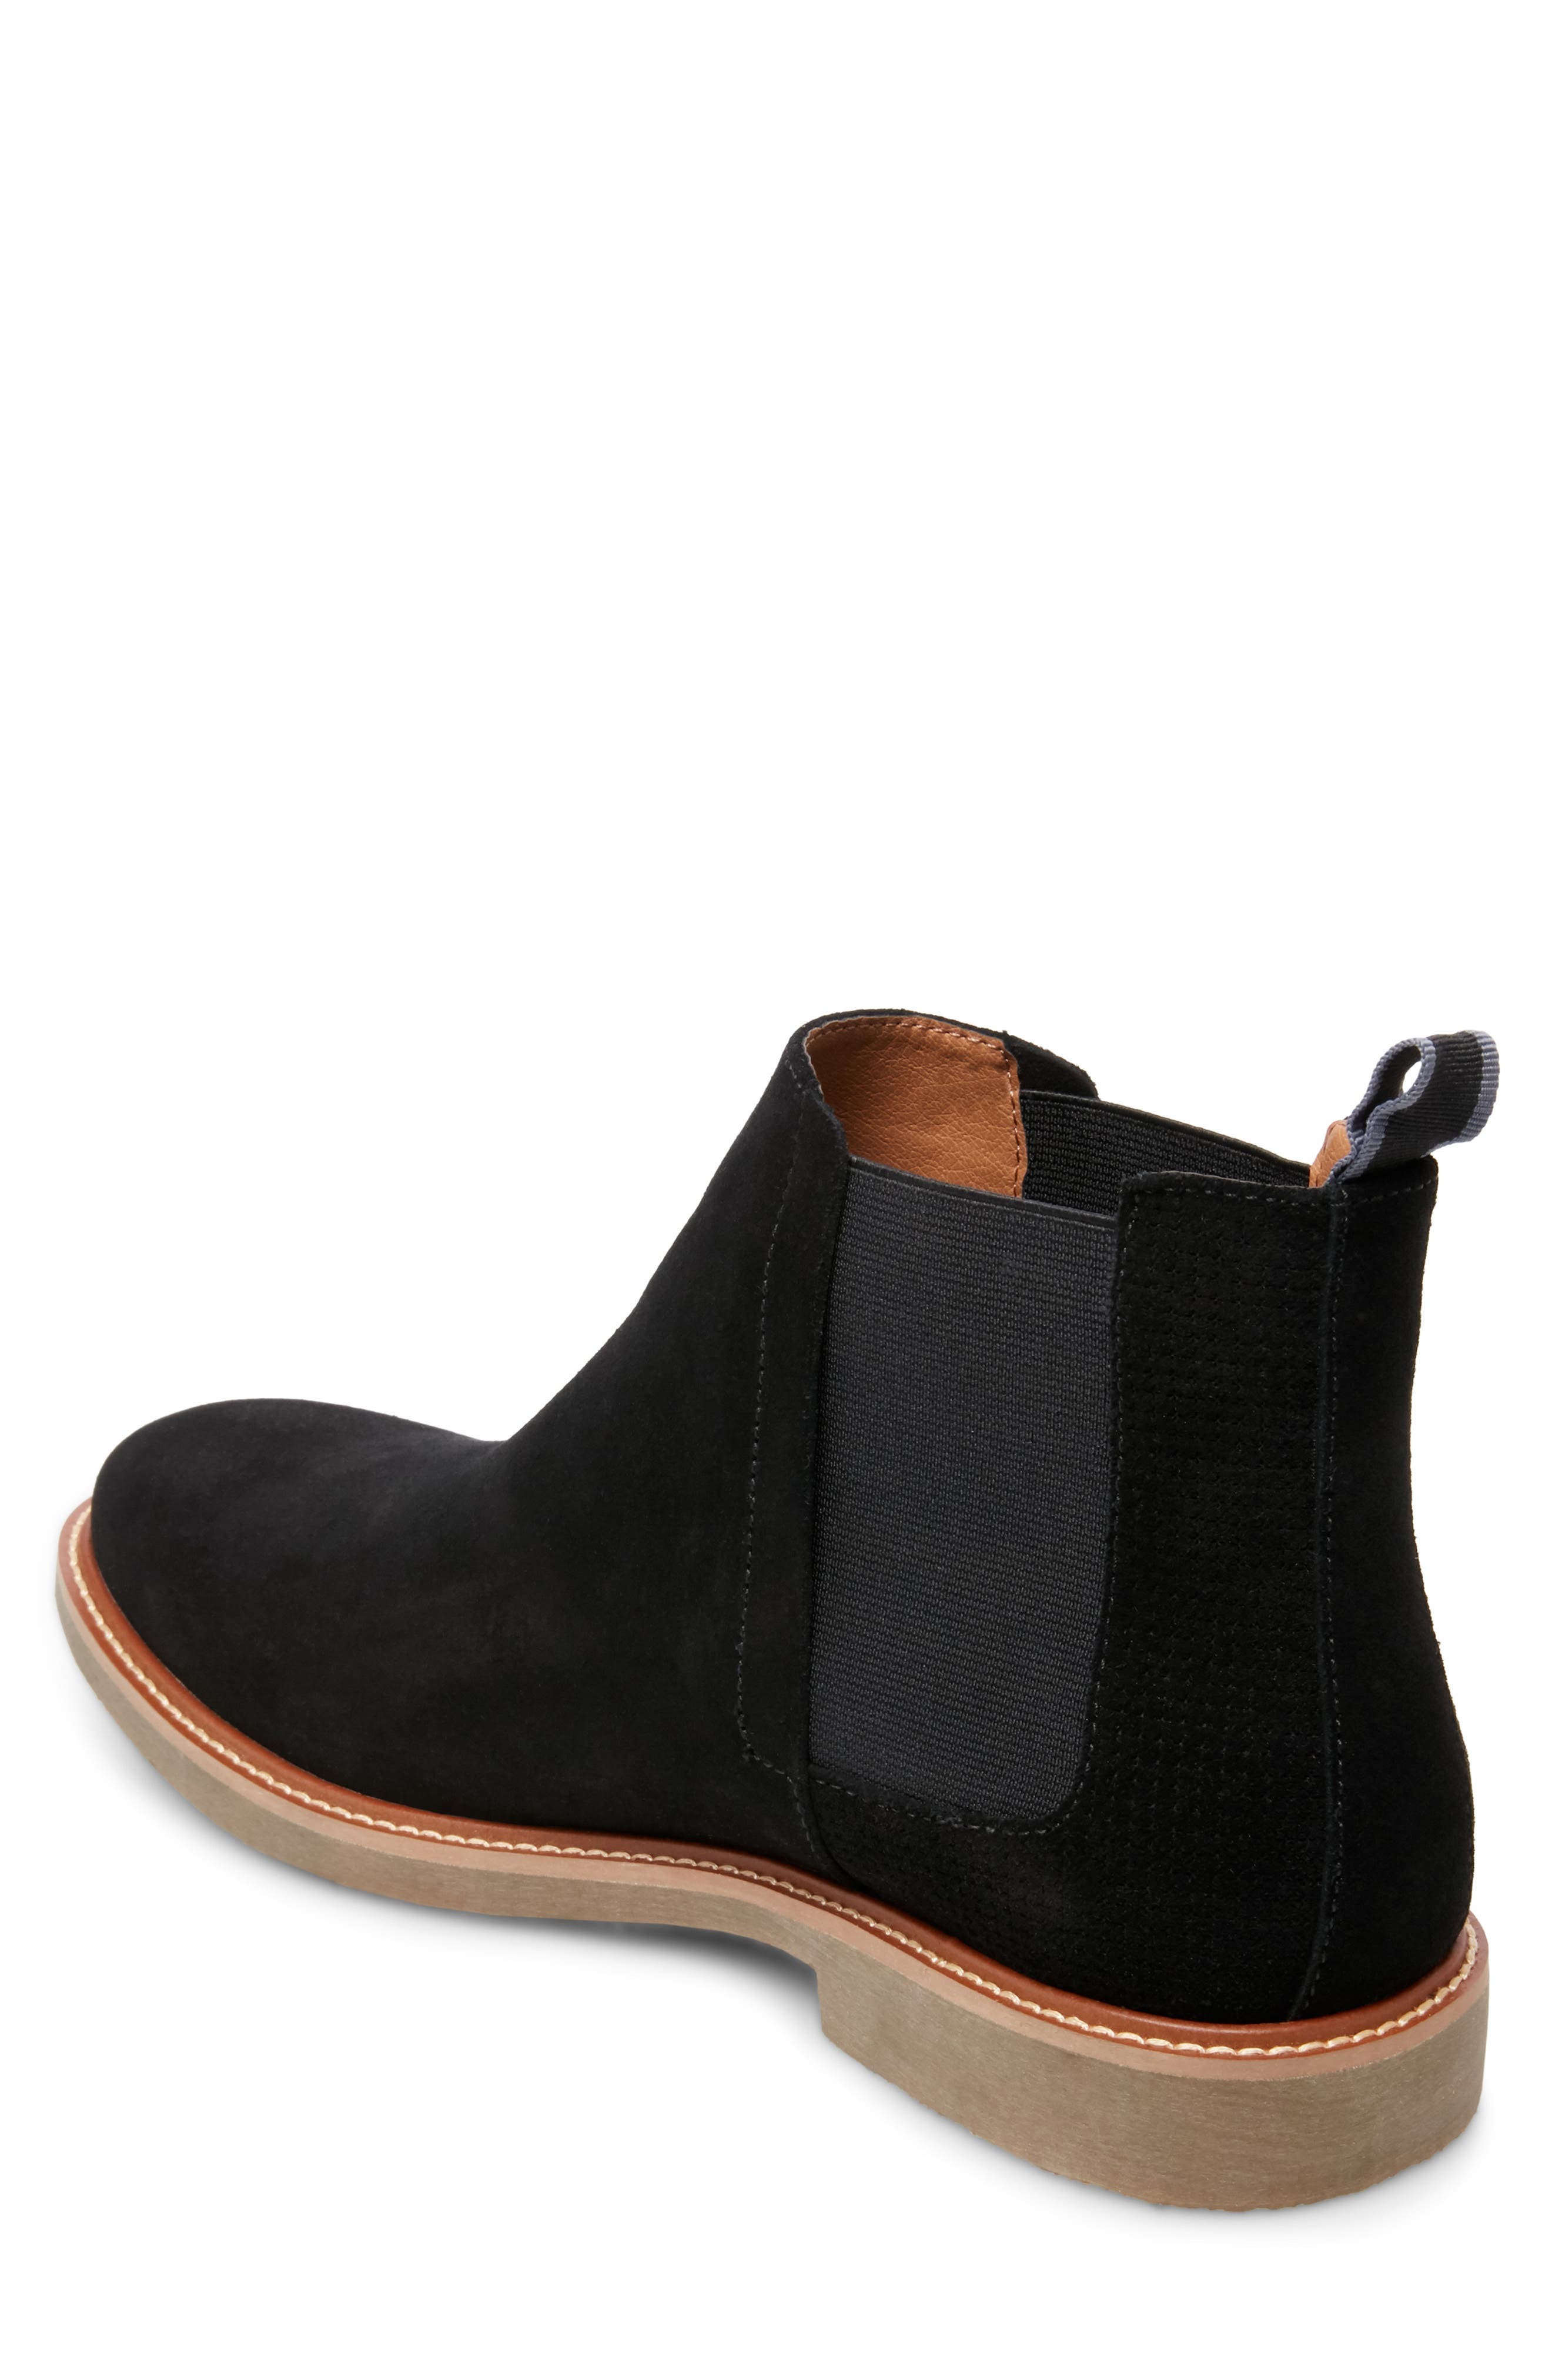 Highlyte Textured Chelsea Boot,                             Alternate thumbnail 2, color,                             006